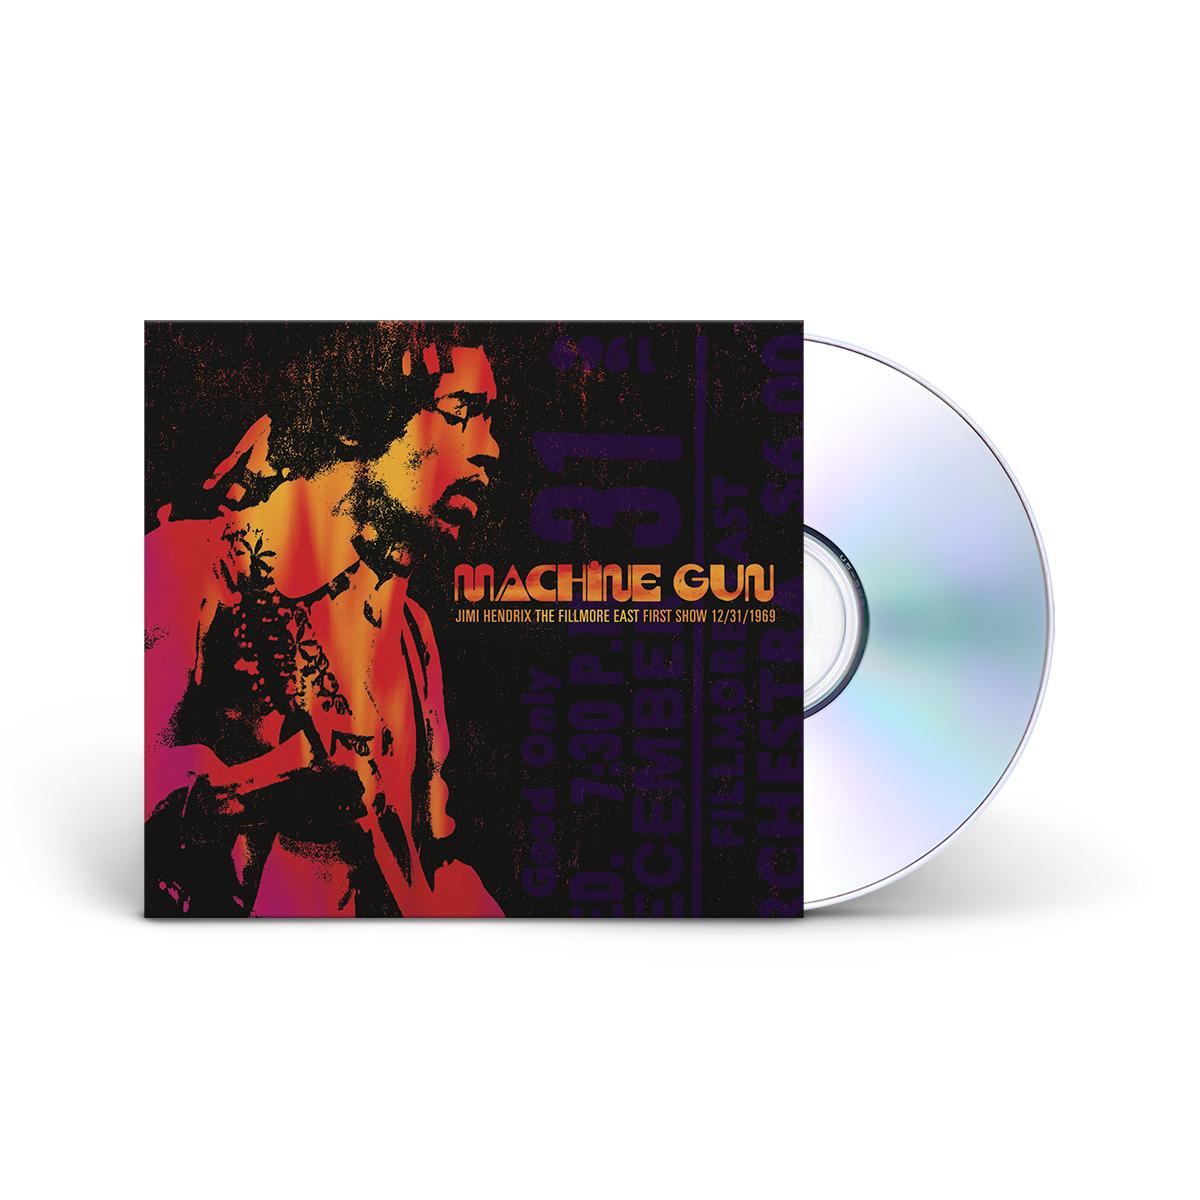 Machine Gun Jimi Hendrix The Fillmore East 12/31/1969 (First Show) CD